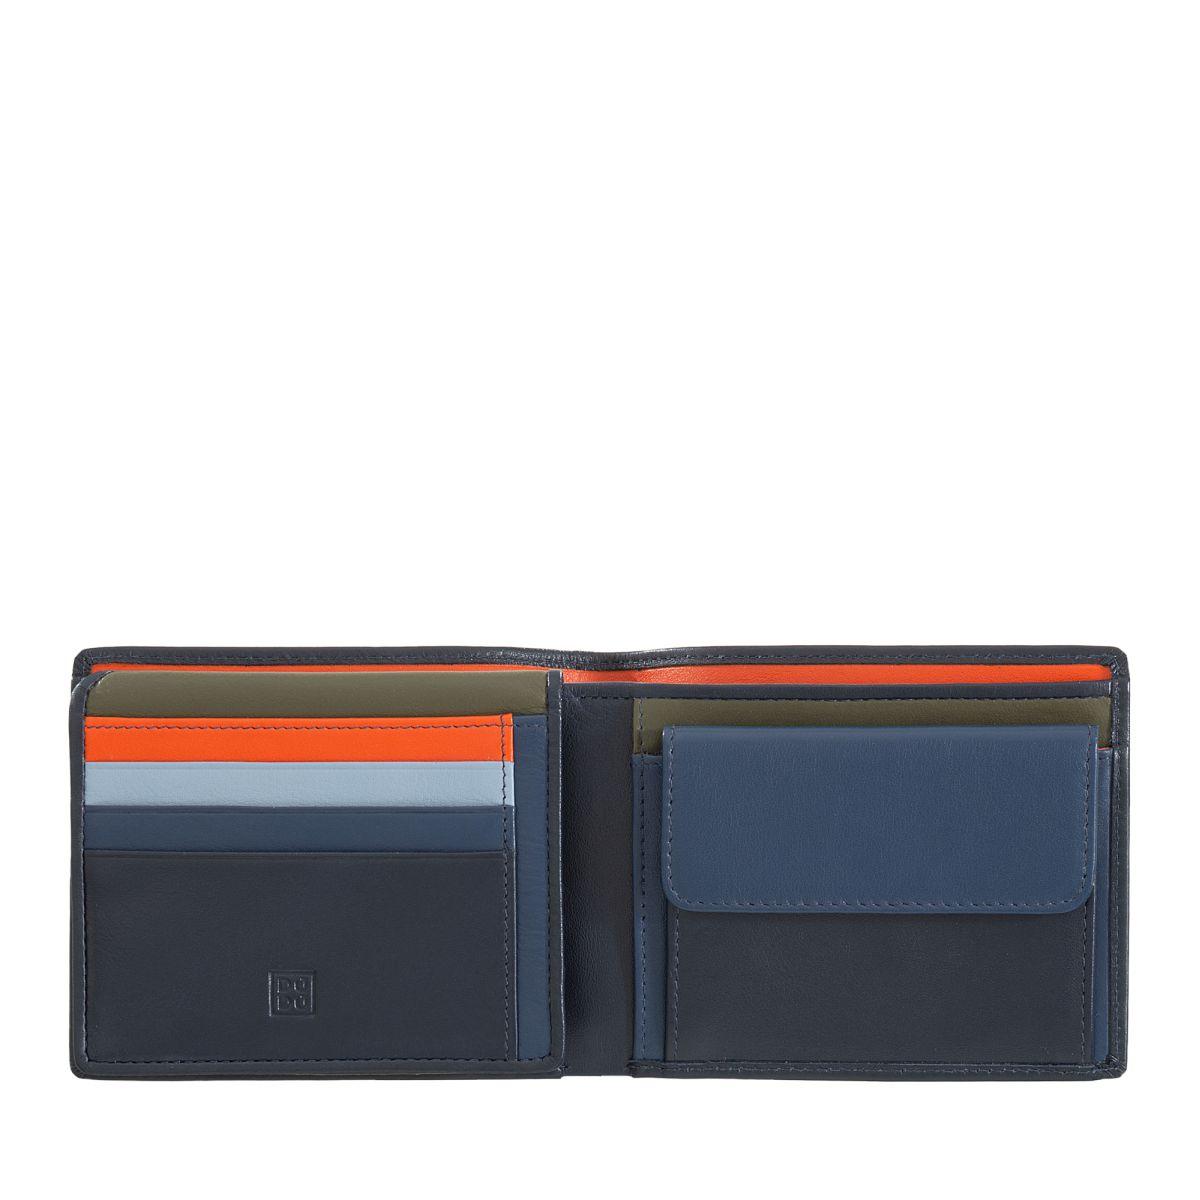 DuDu ארנק עור קלאסי עם תא למטבעות - כחול נייבי